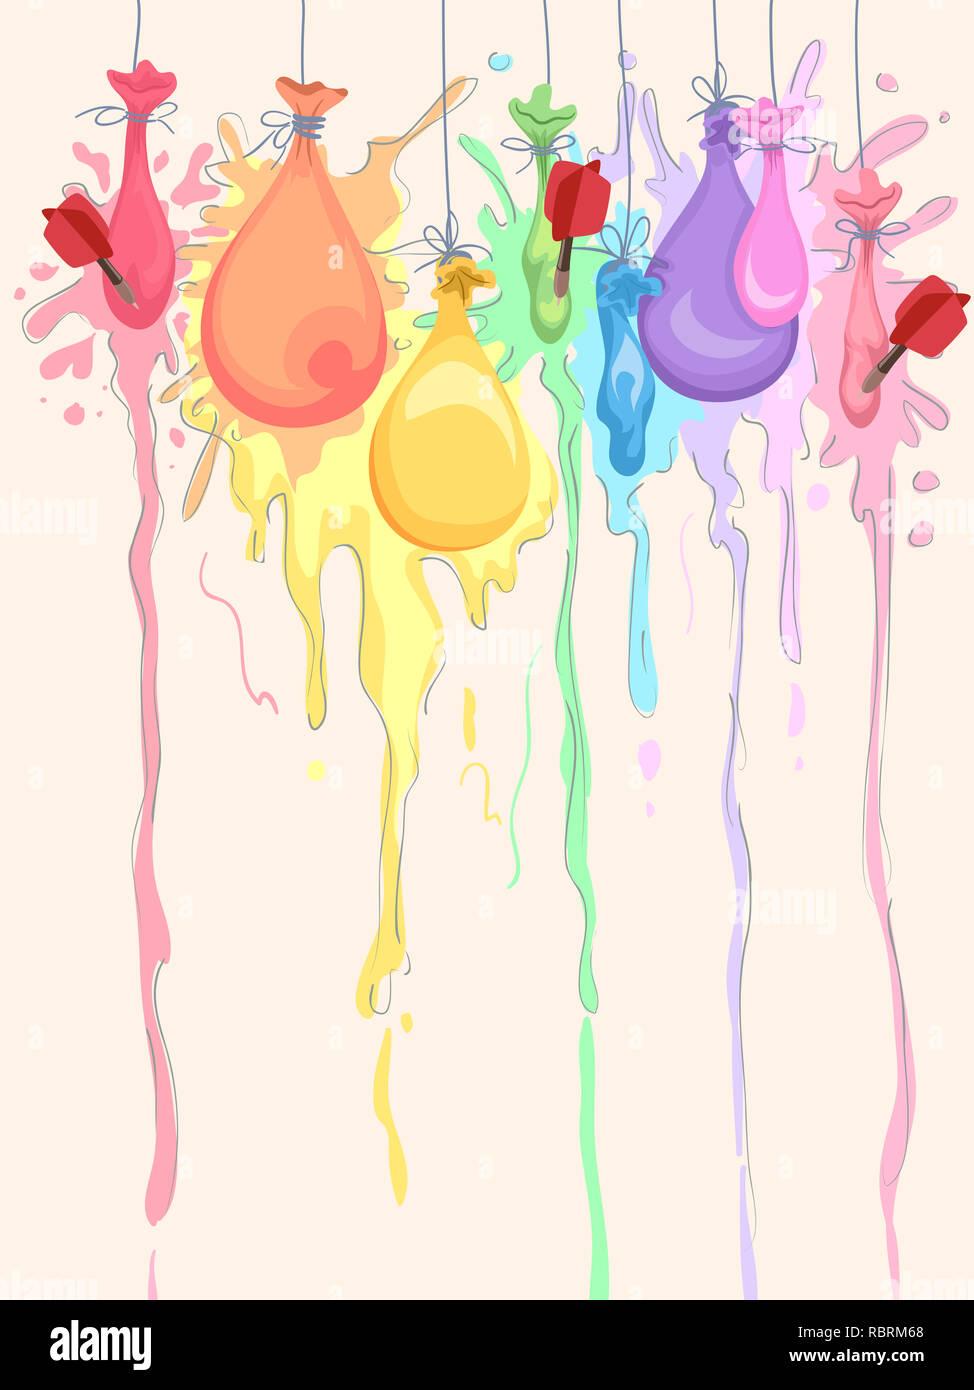 Illustration Of Darts Popping Paint Balloons To Create Art Stock Photo Alamy